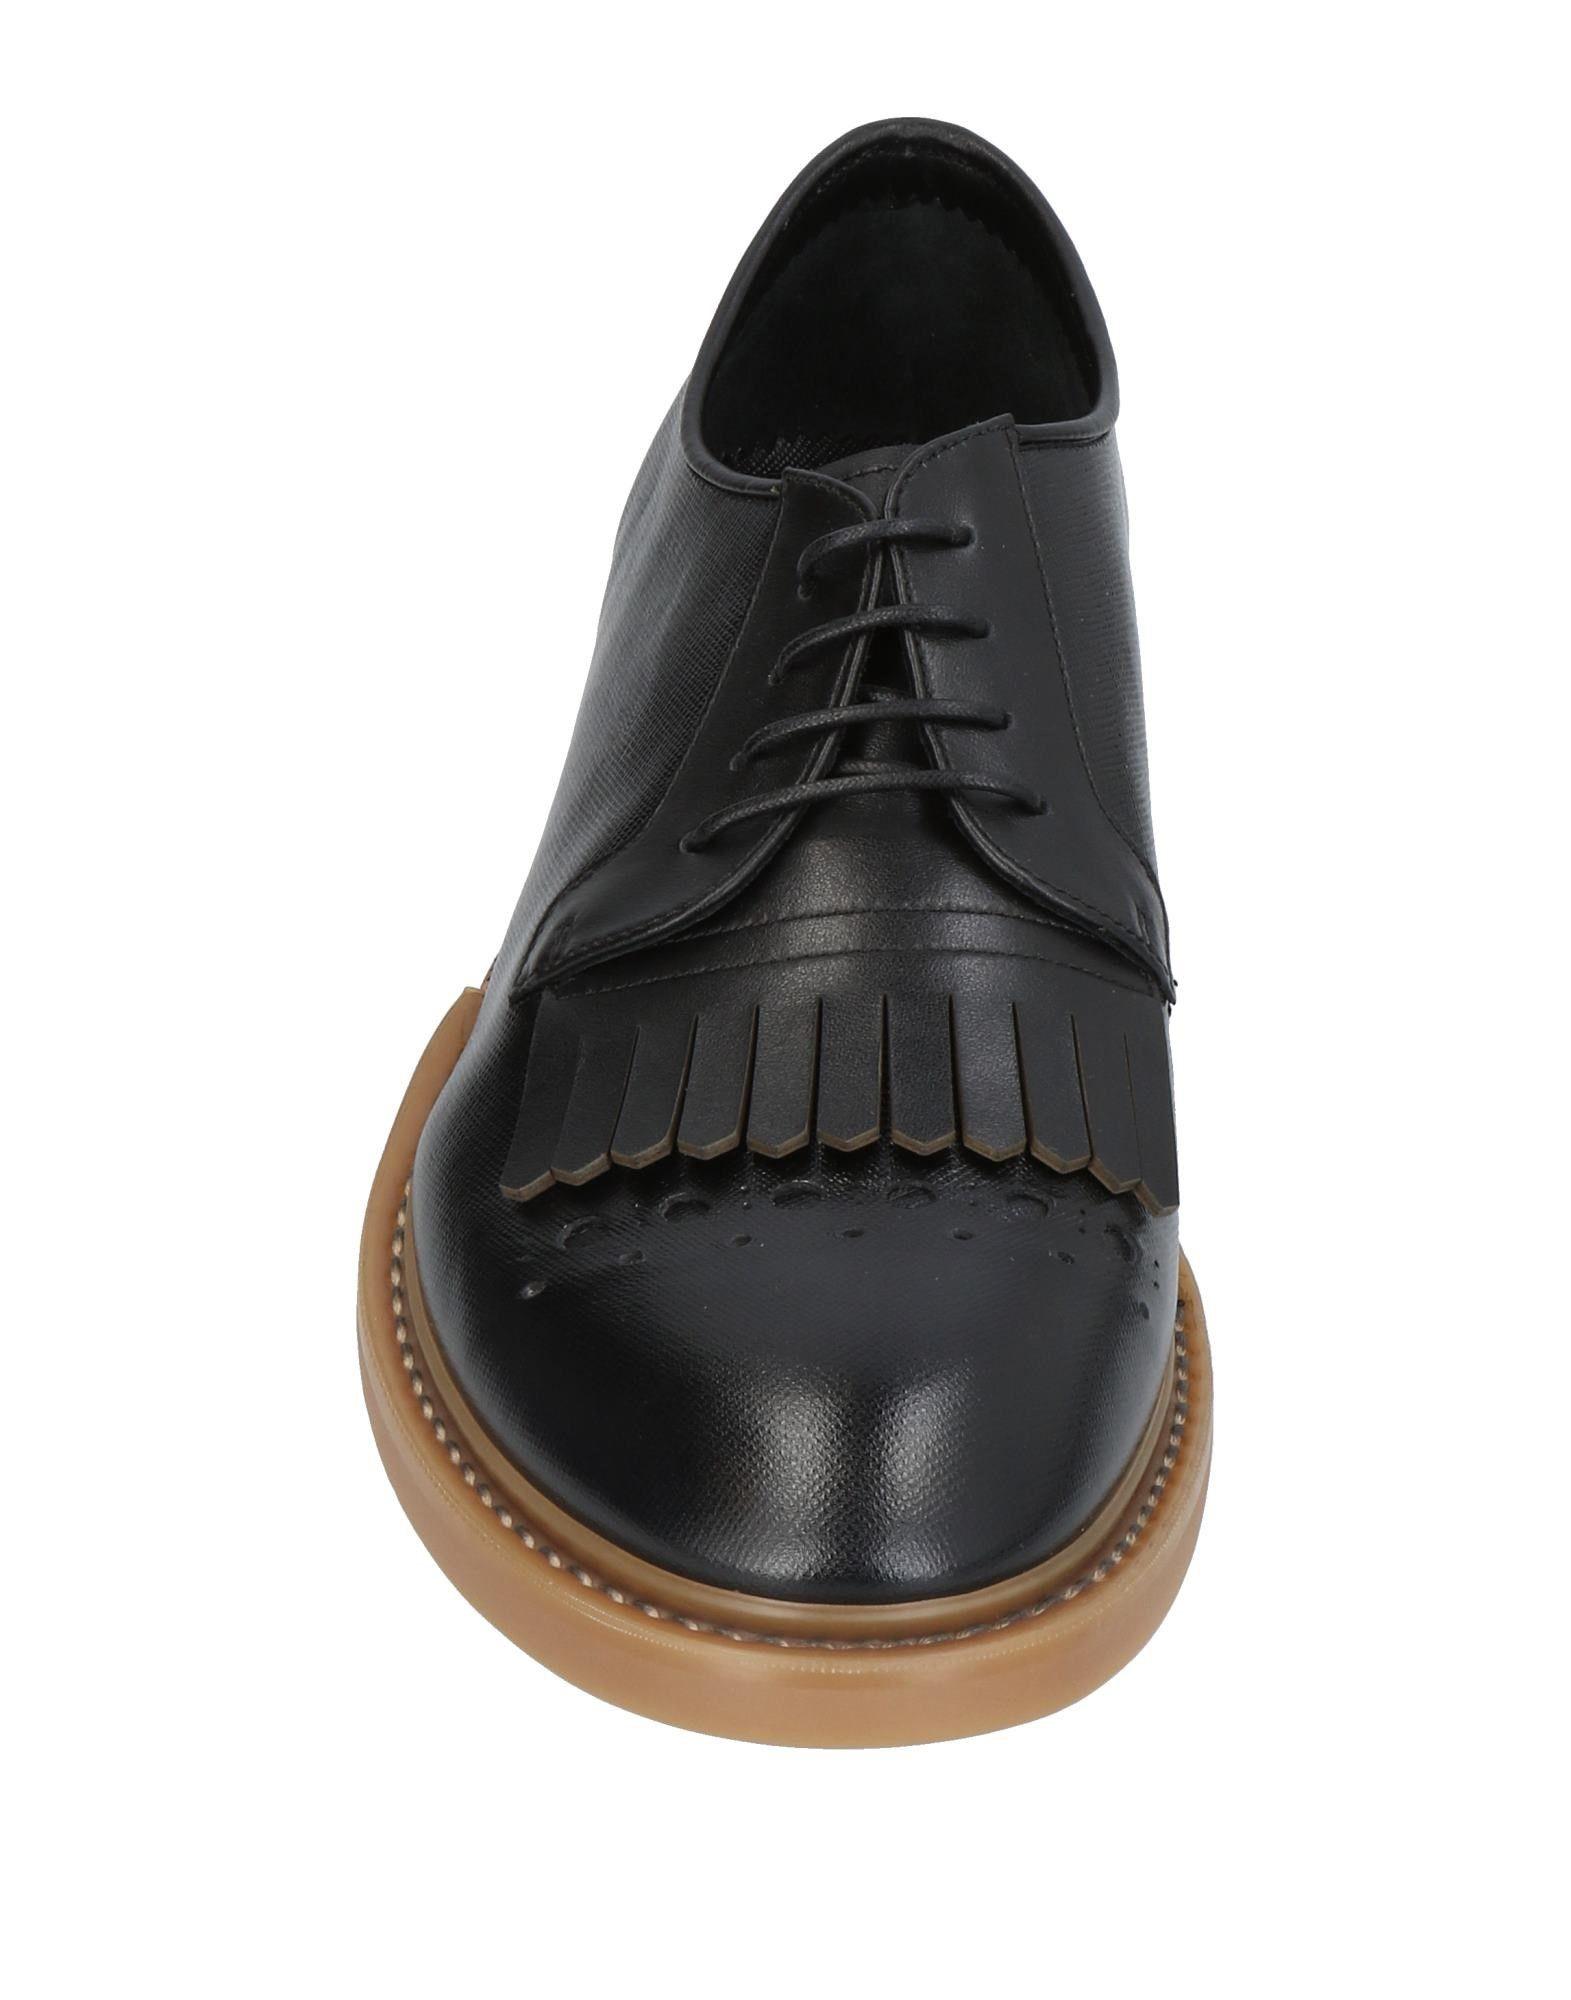 R7bqhr À Barracuda Homme Chaussures Lacets U8I5q